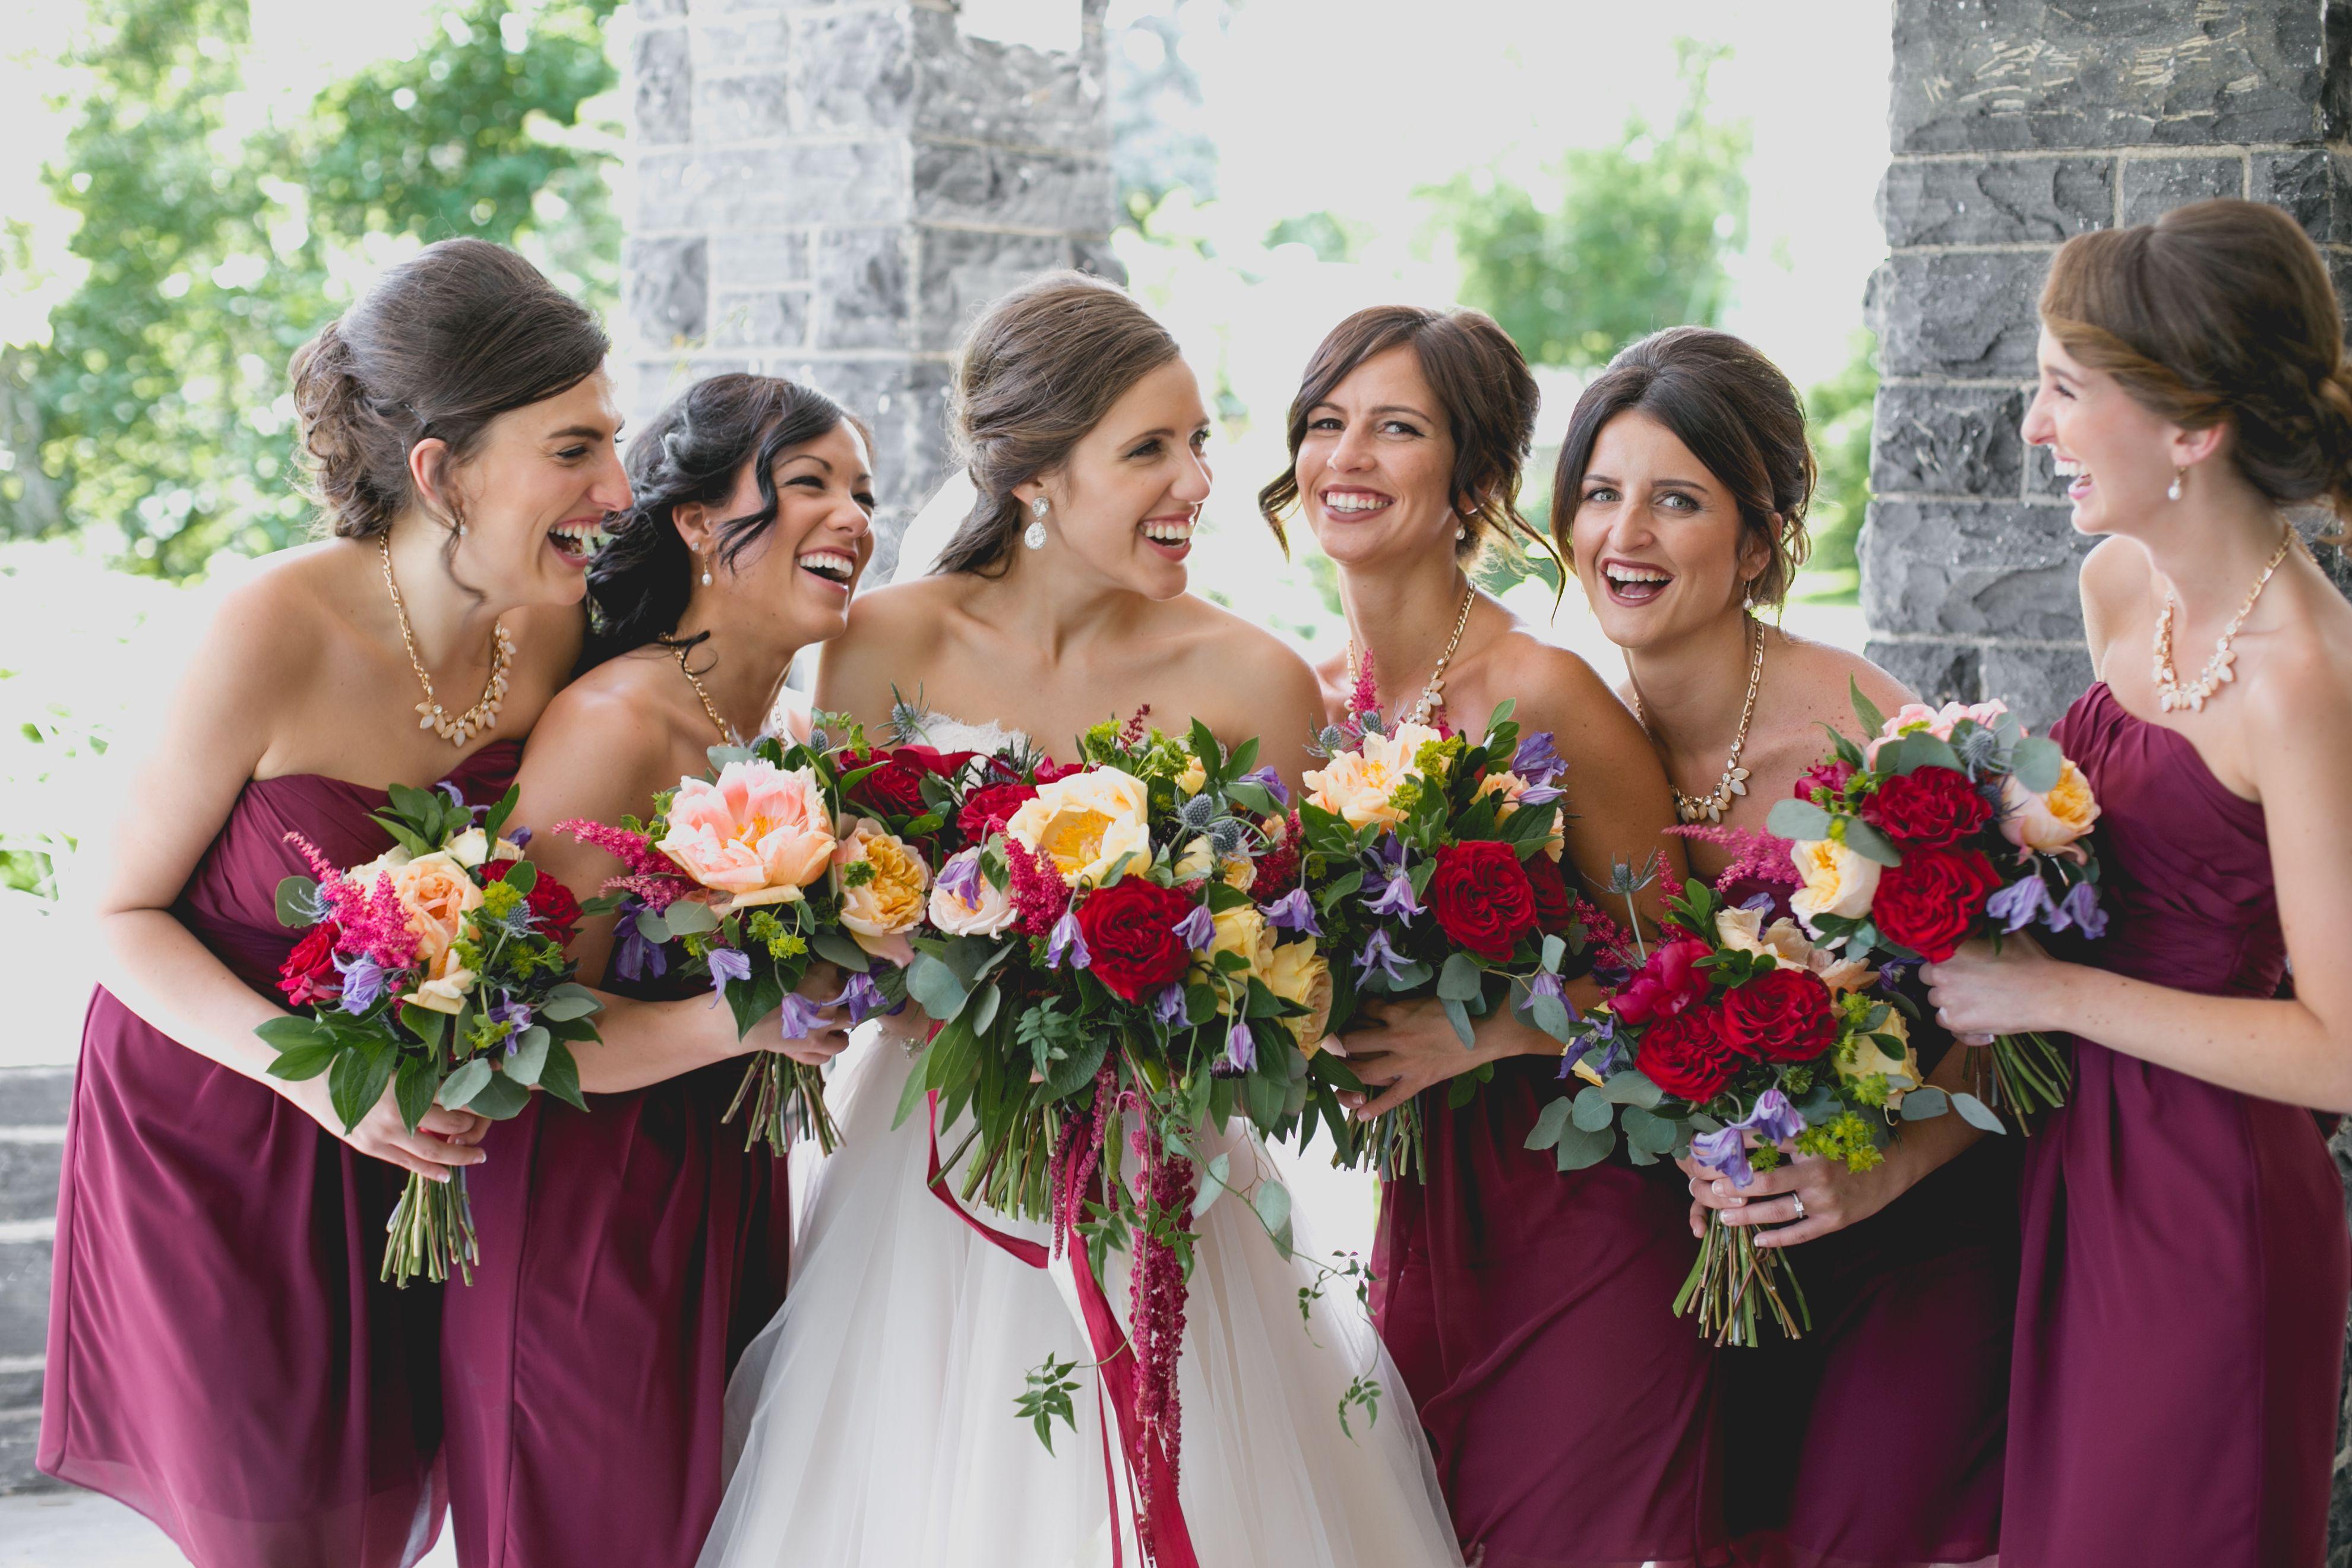 e41ca3593b Bill Levkoff bridesmaids dresses in wine